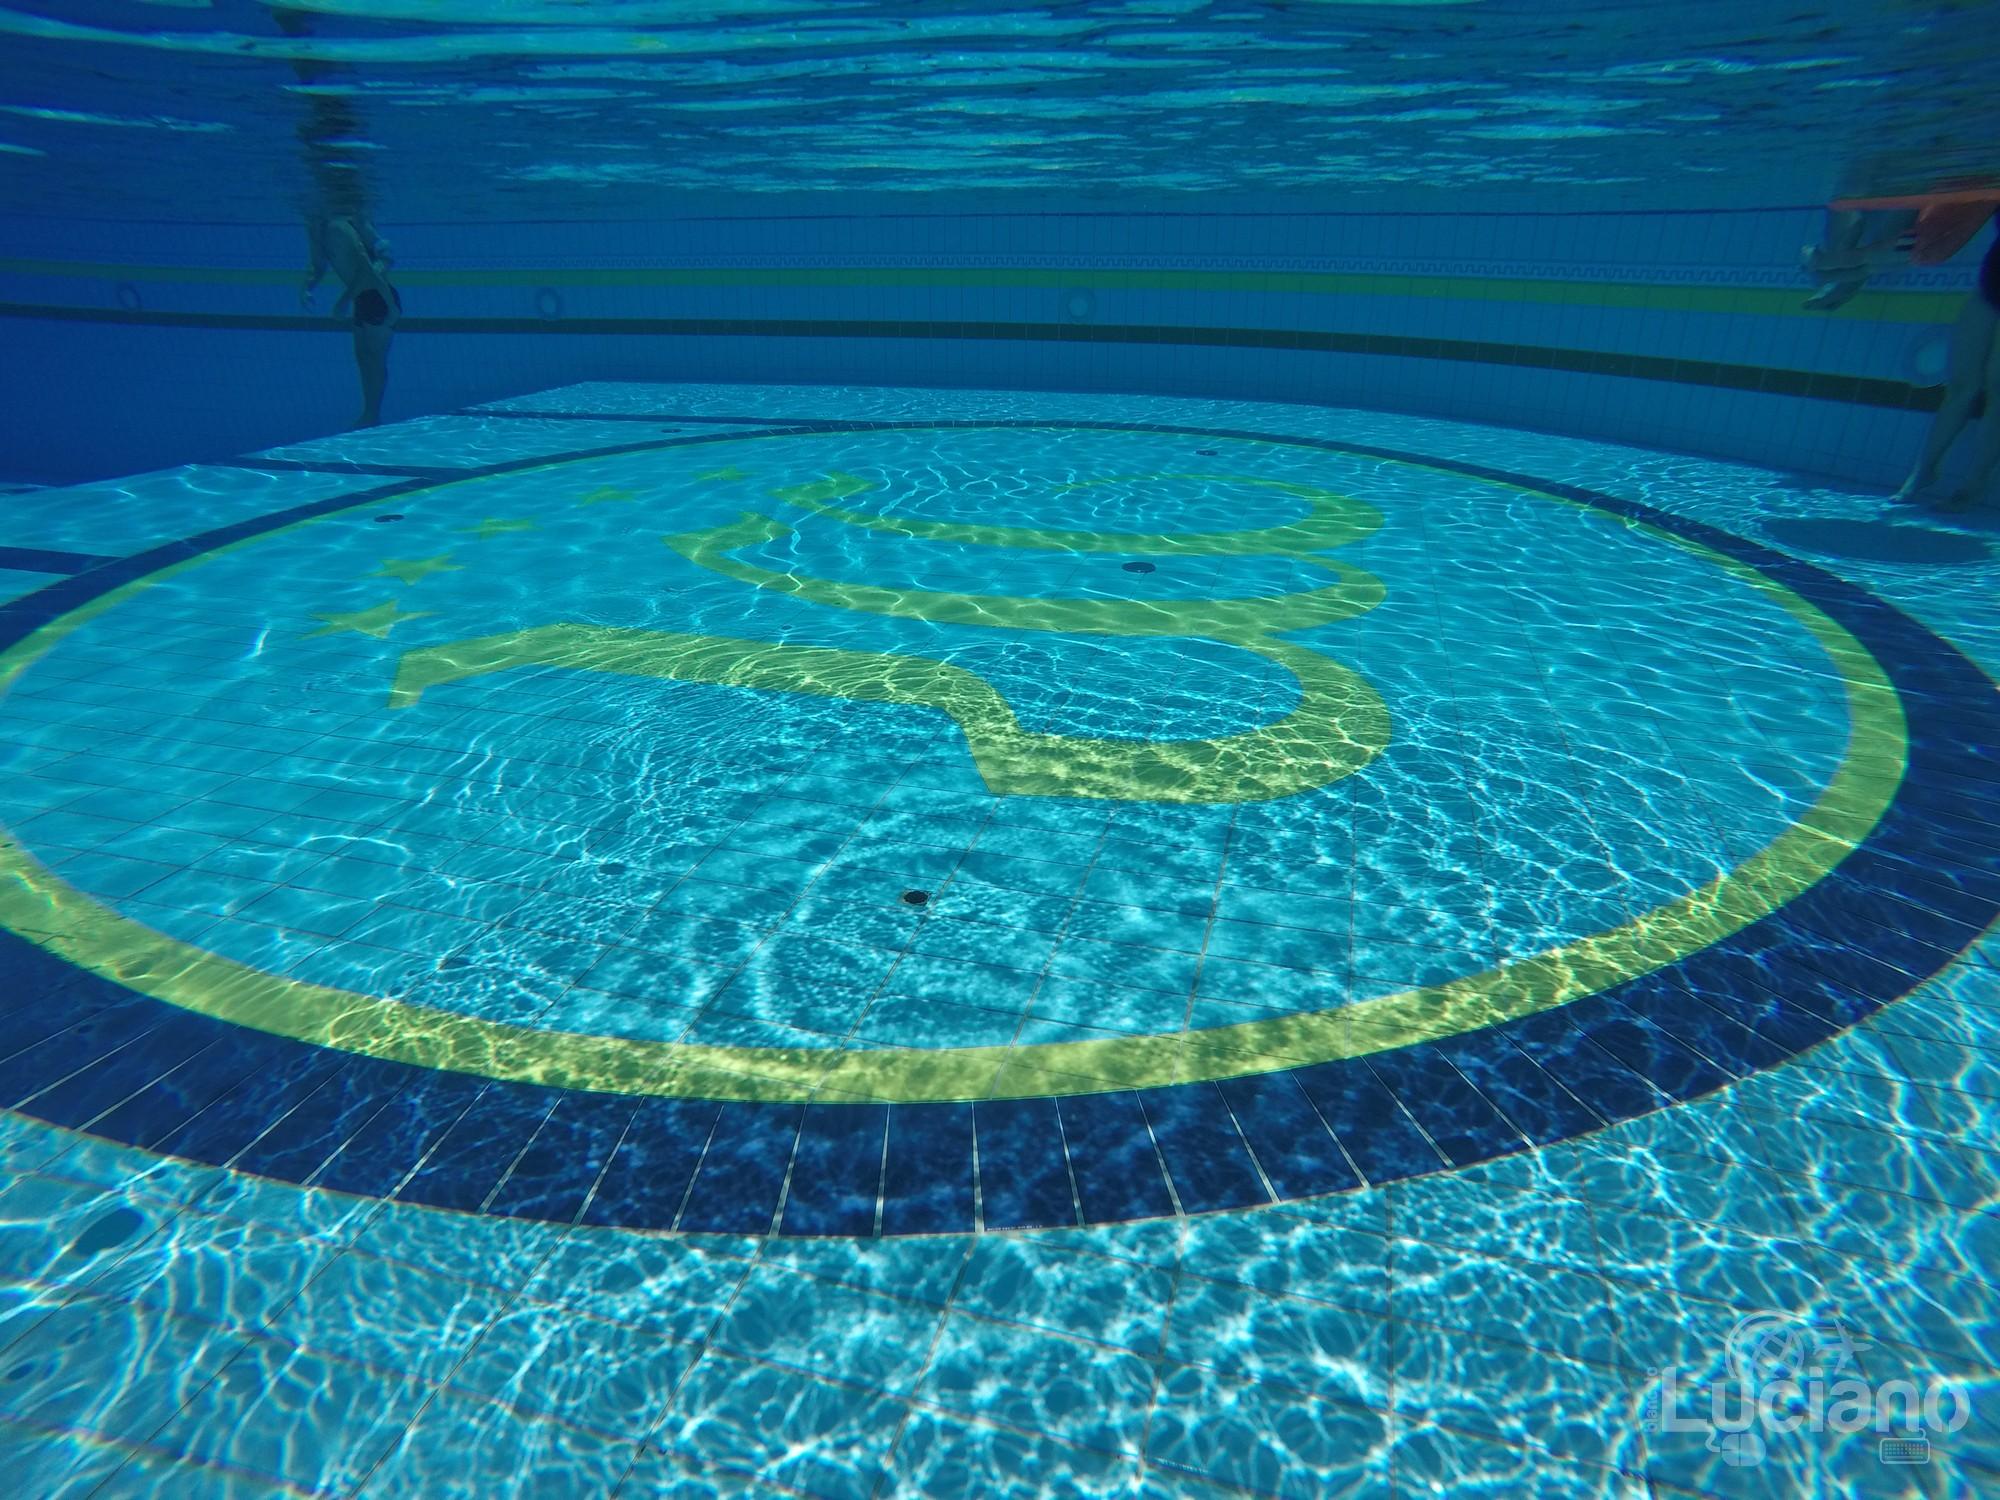 Grand Hotel - Minareto - piscina olimpionica - LOGO